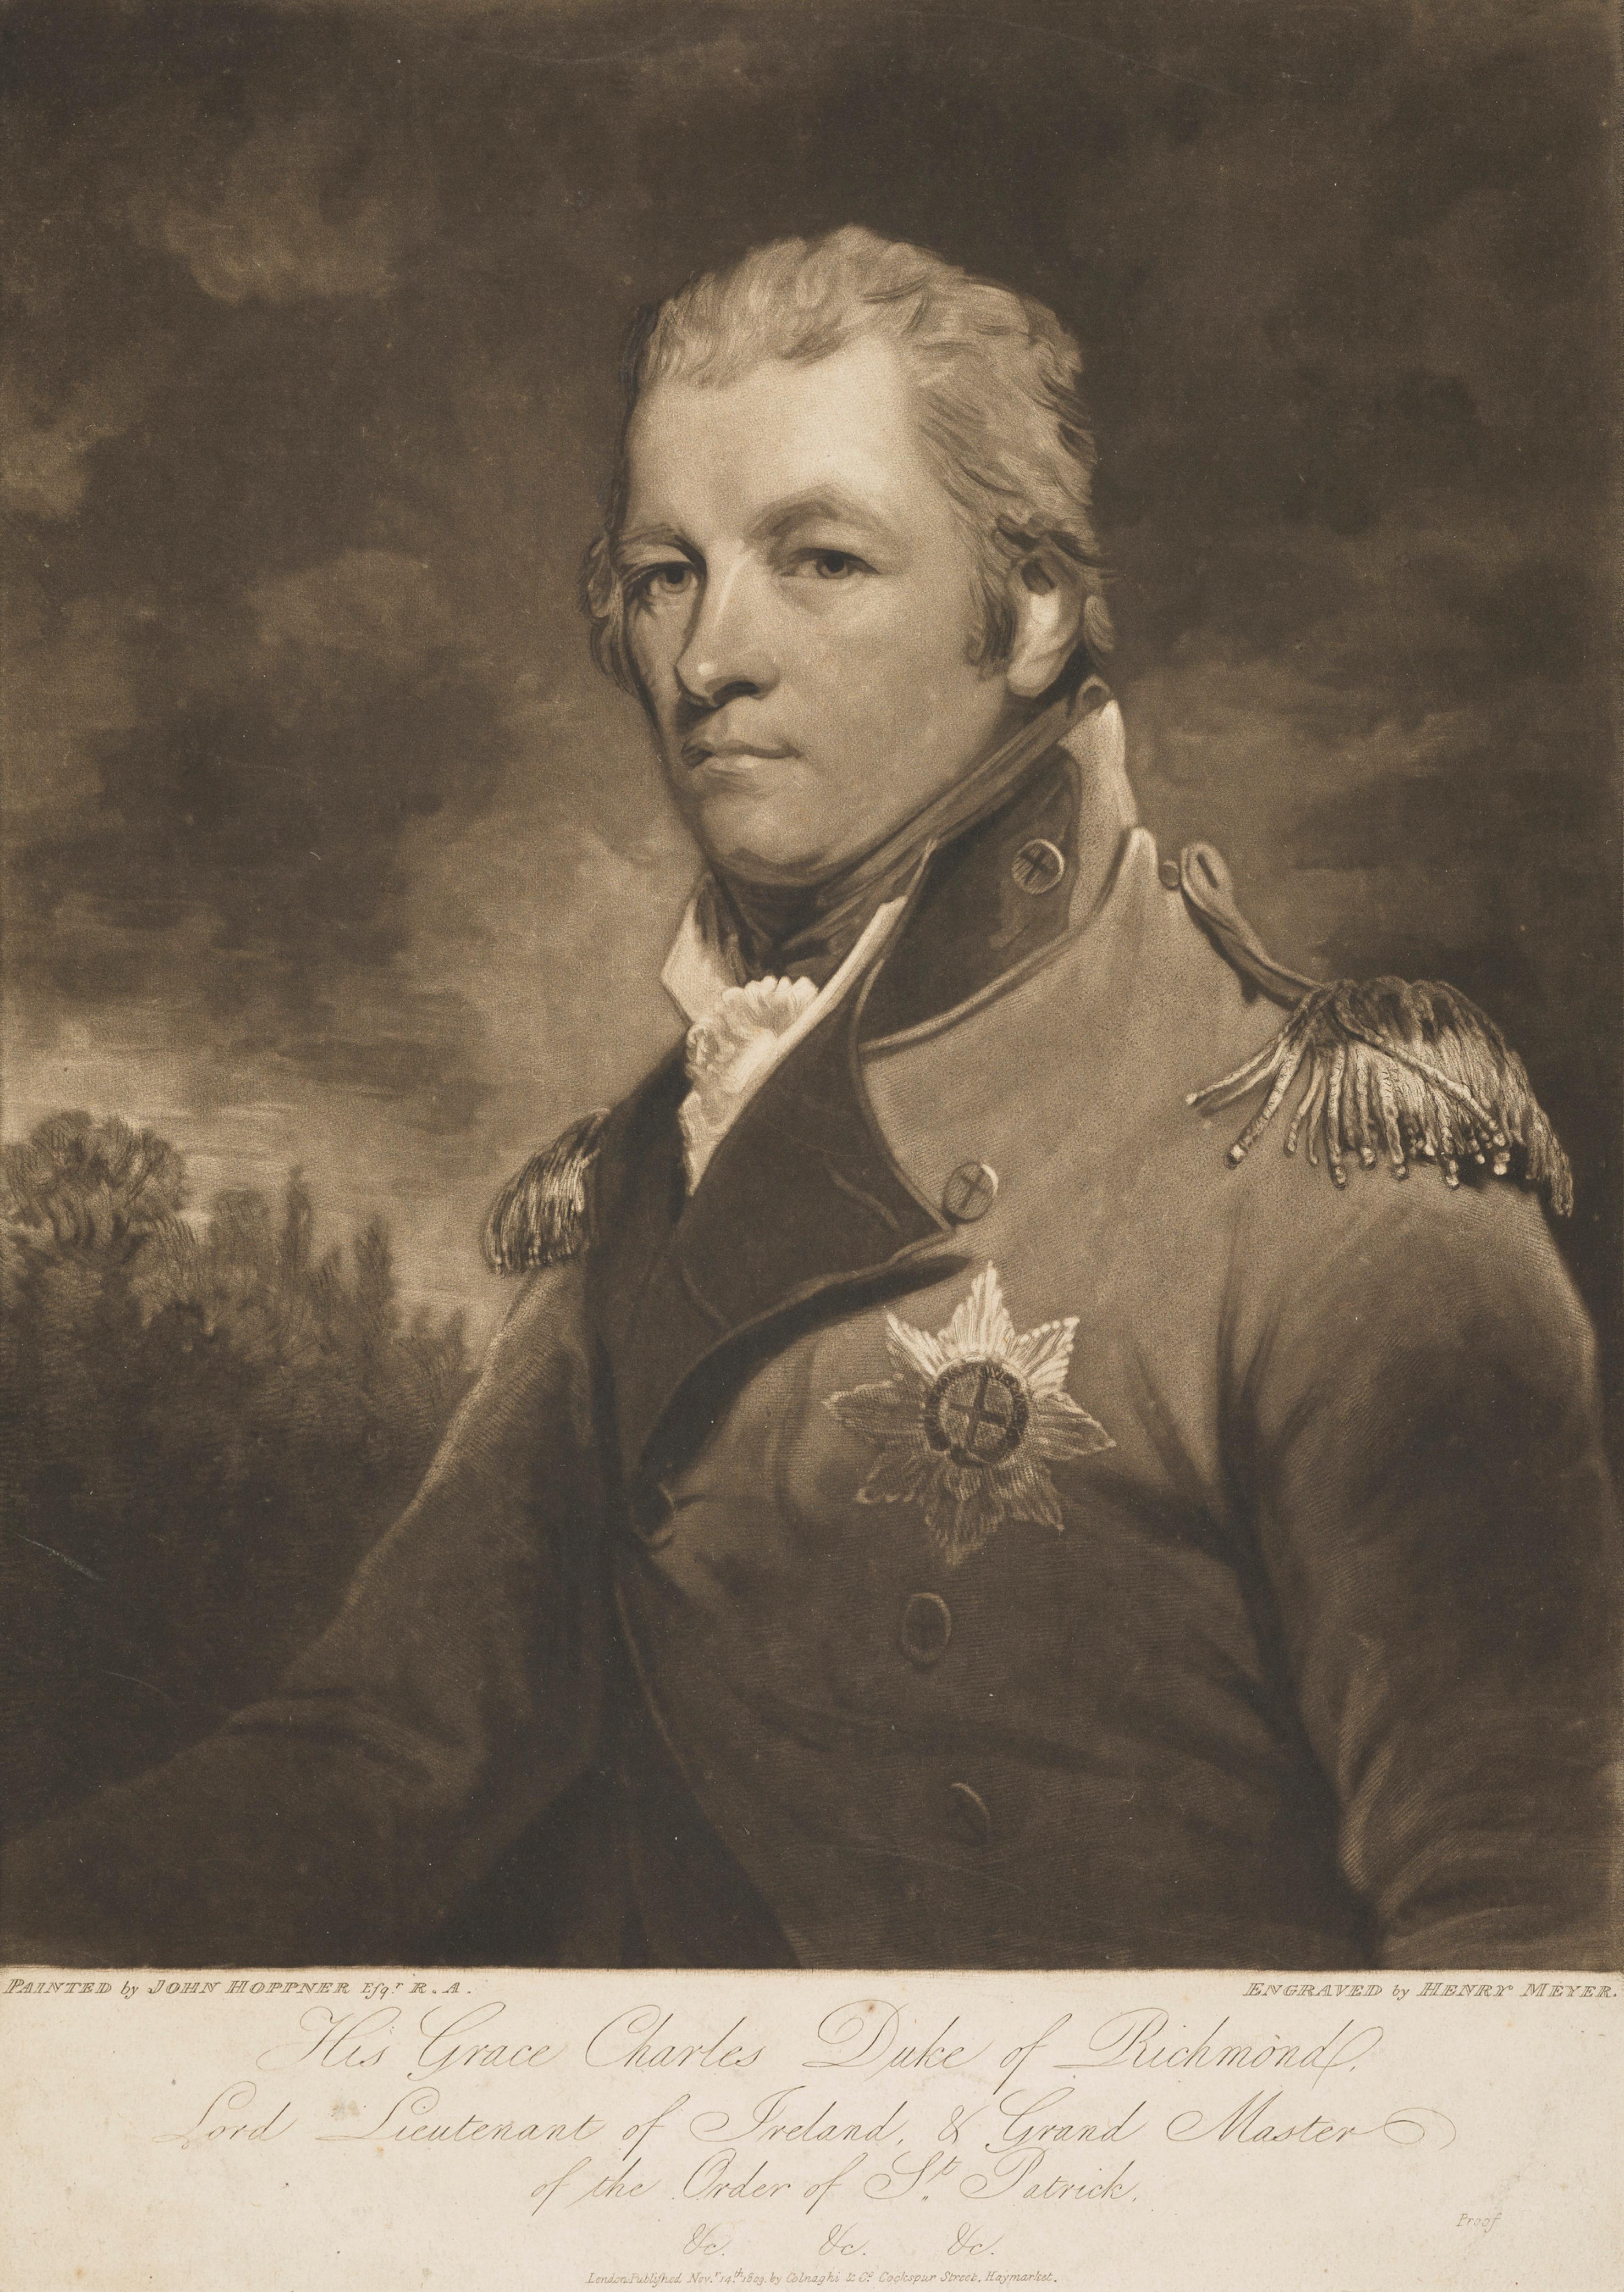 Charles Lennox, fourth duke of richmond